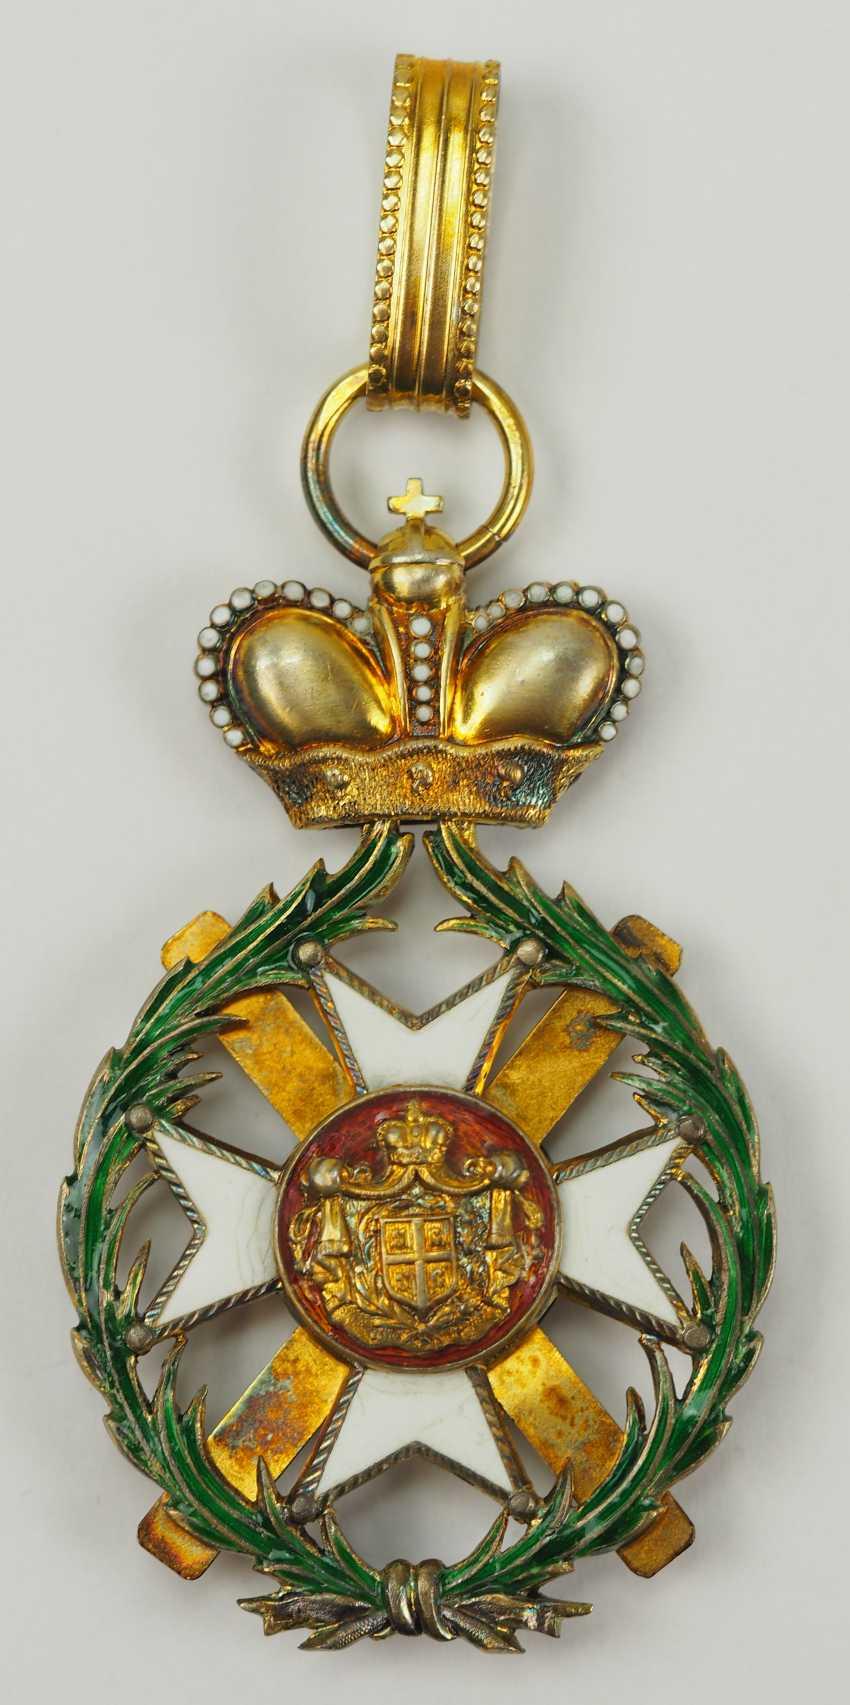 Serbia: order of the cross of Takowo, 1. Model (1865-1868), Comtur Cross. - photo 4